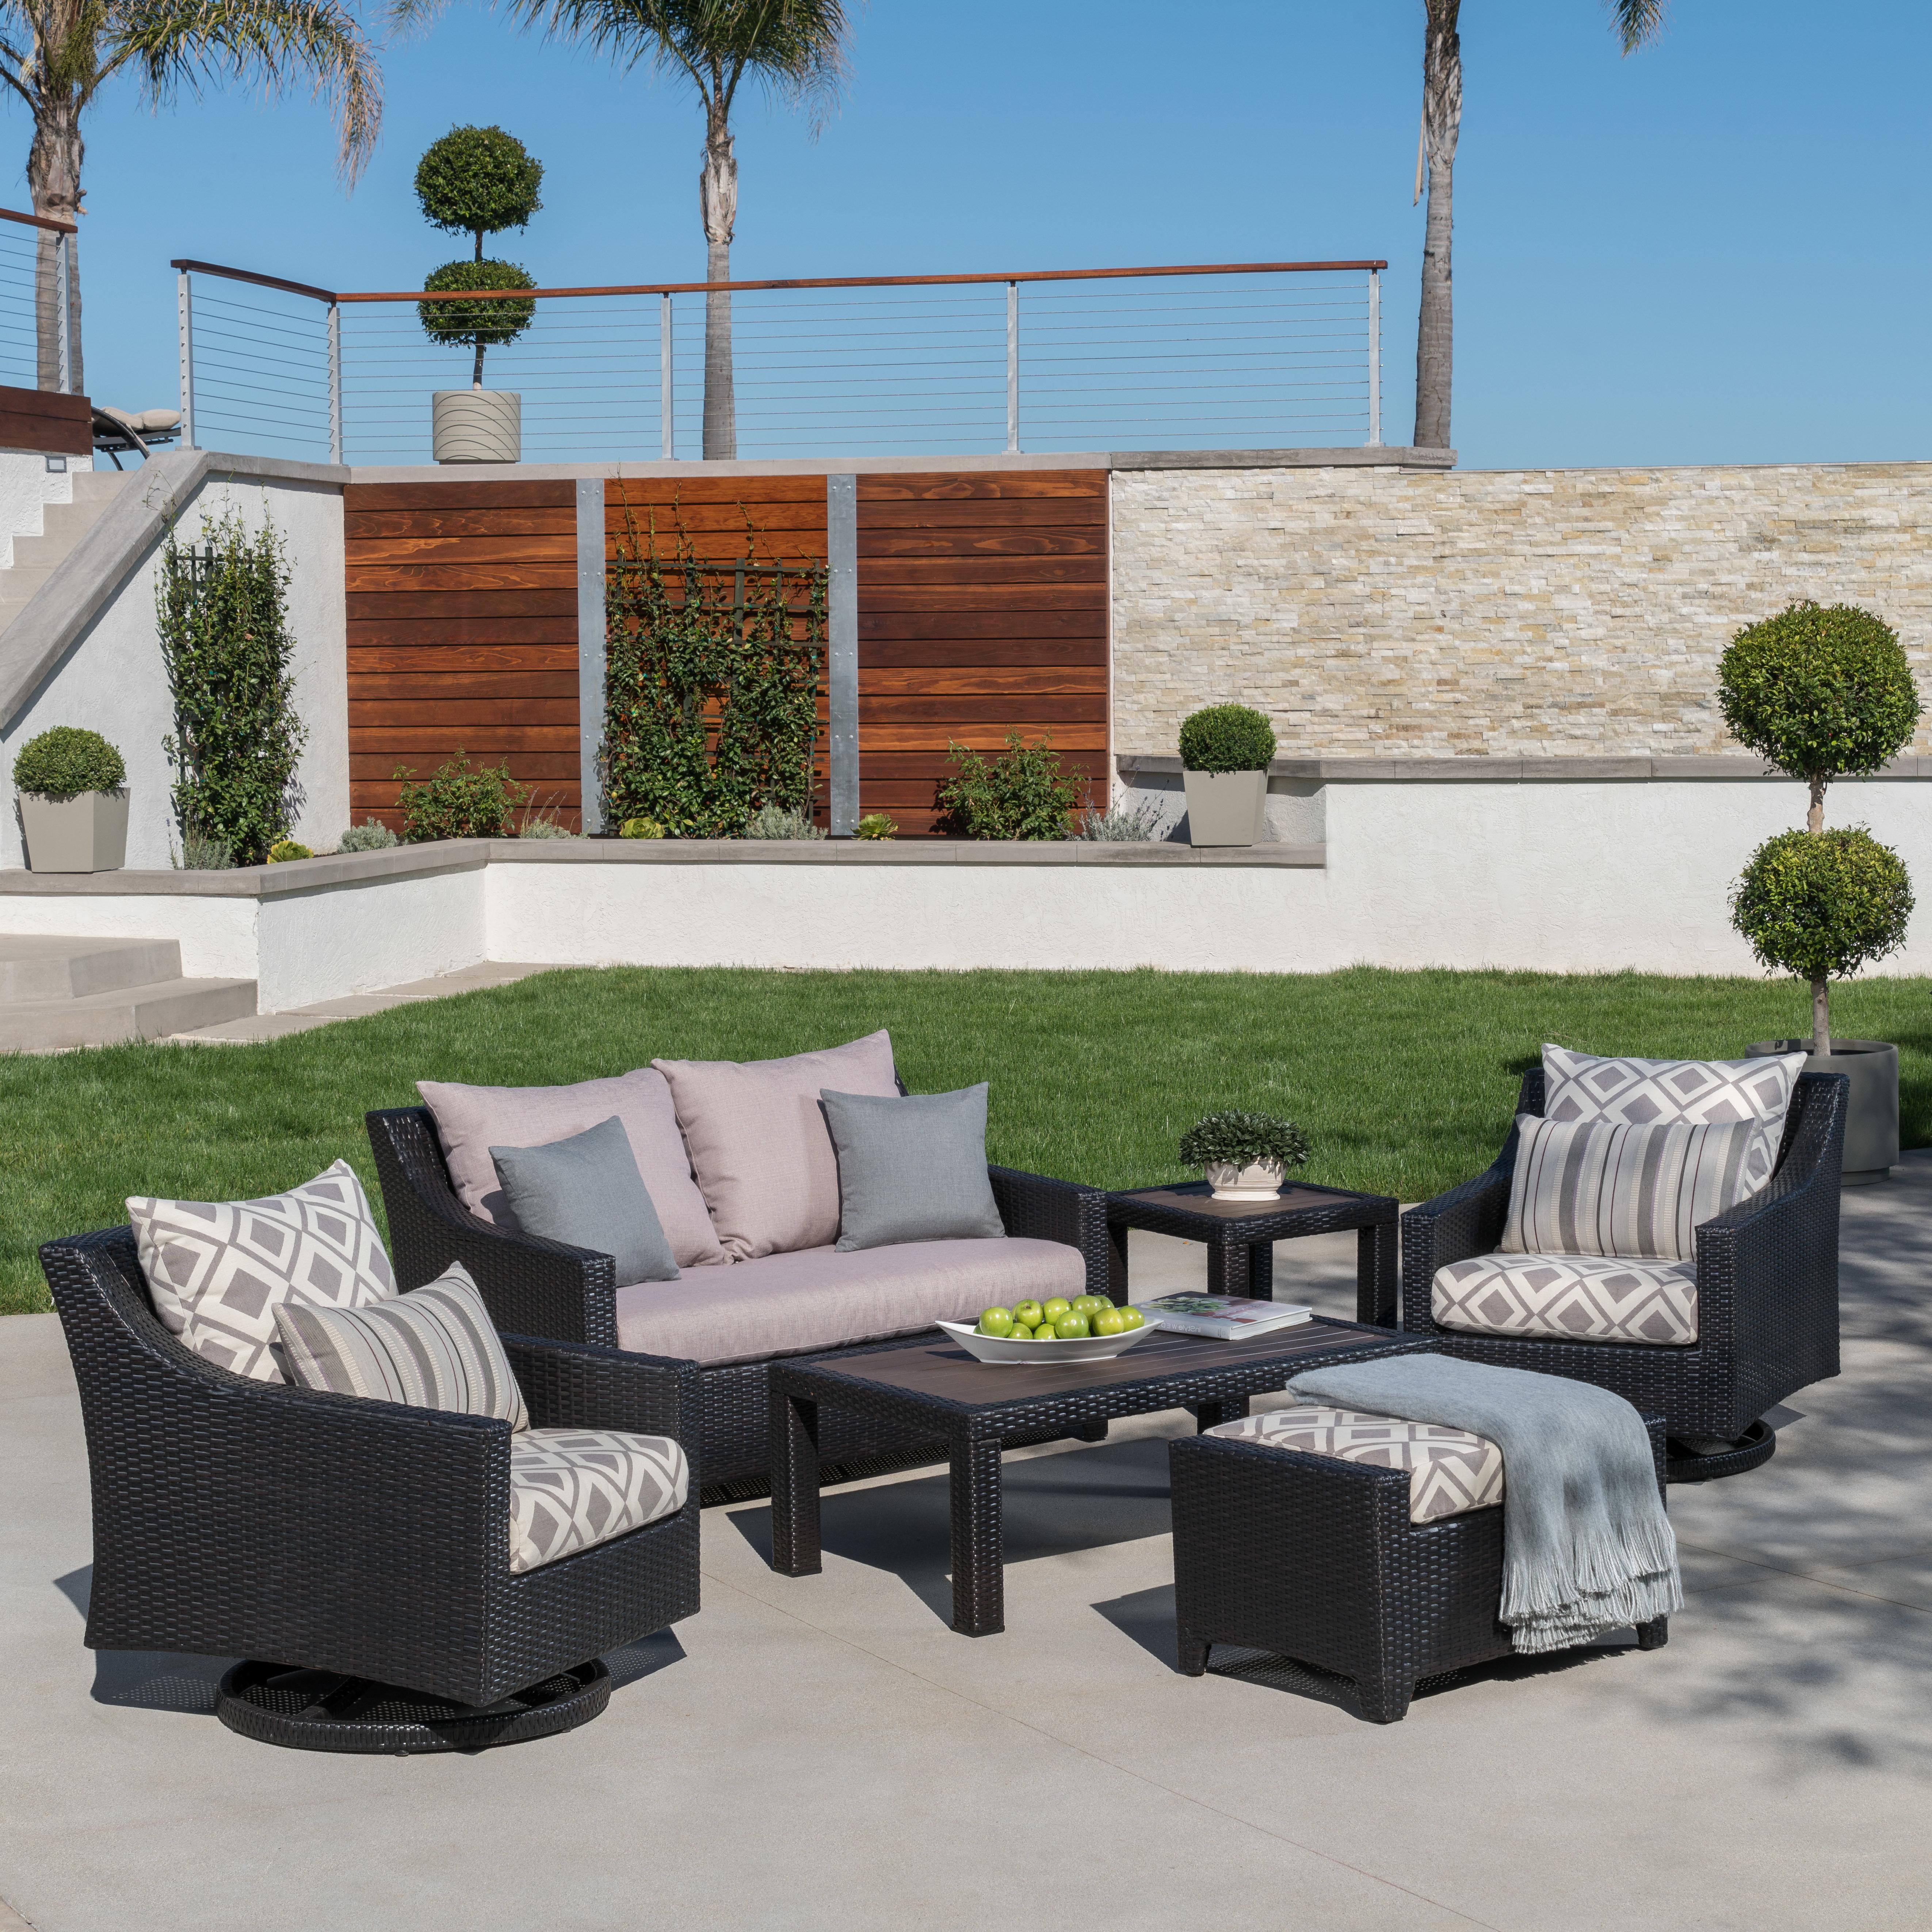 Preferred Northridge Loveseats With Cushions Throughout Northridge 6 Piece Sunbrella Sofa Set With Cushions (View 17 of 20)